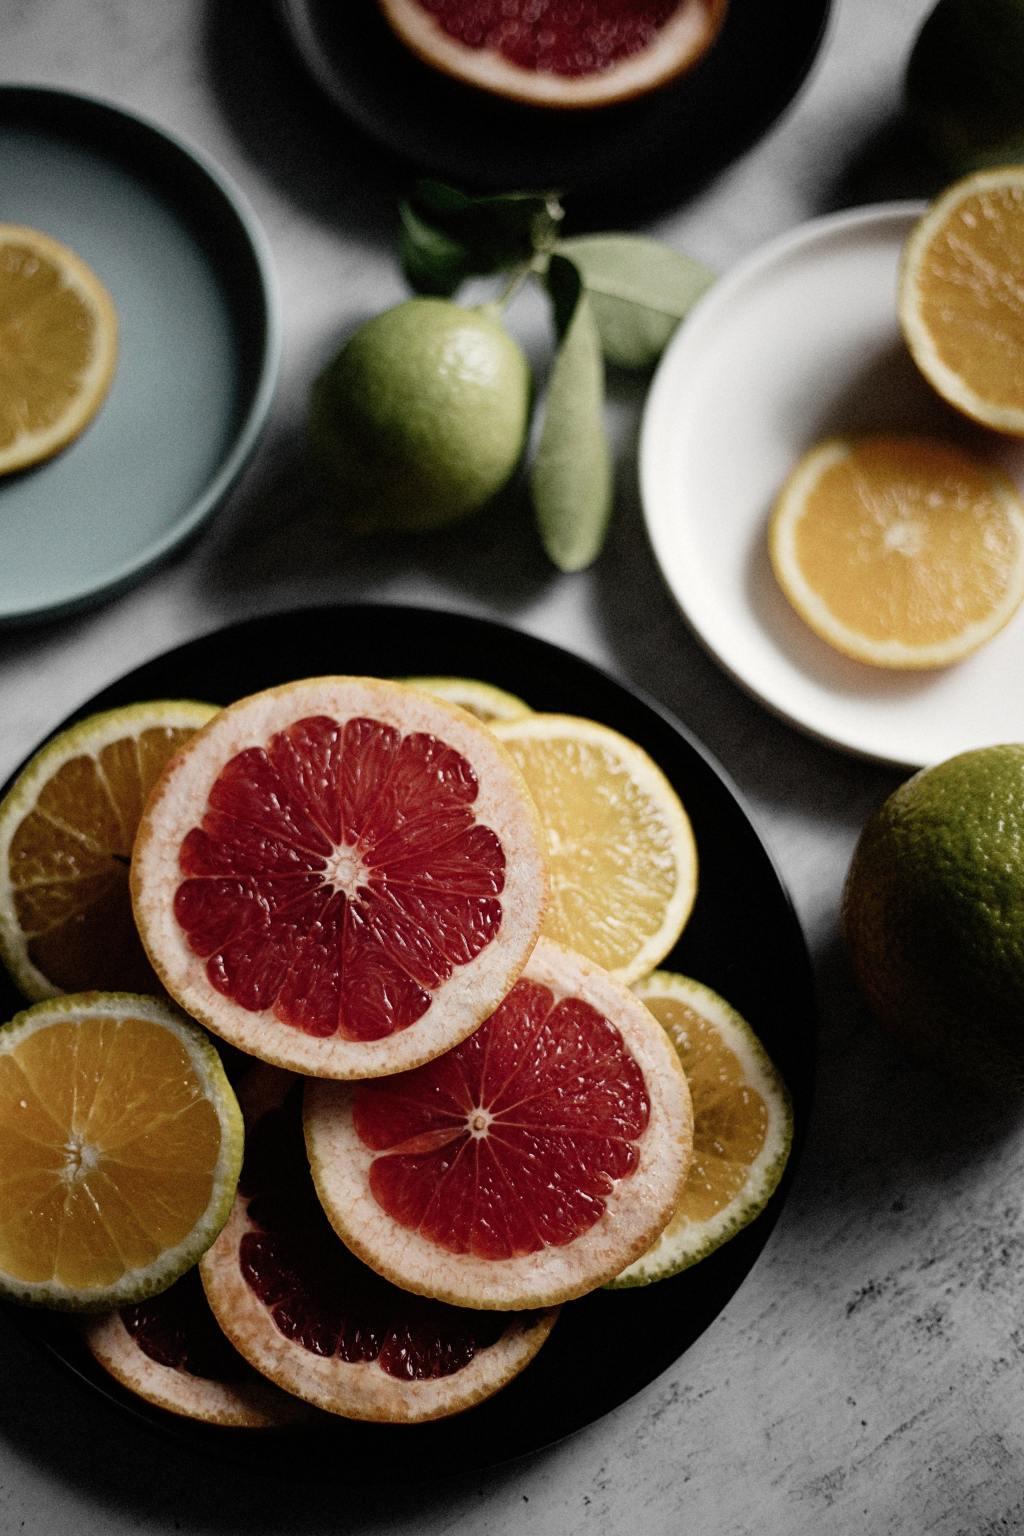 Citric Acid AHA derived from Citrus Fruit